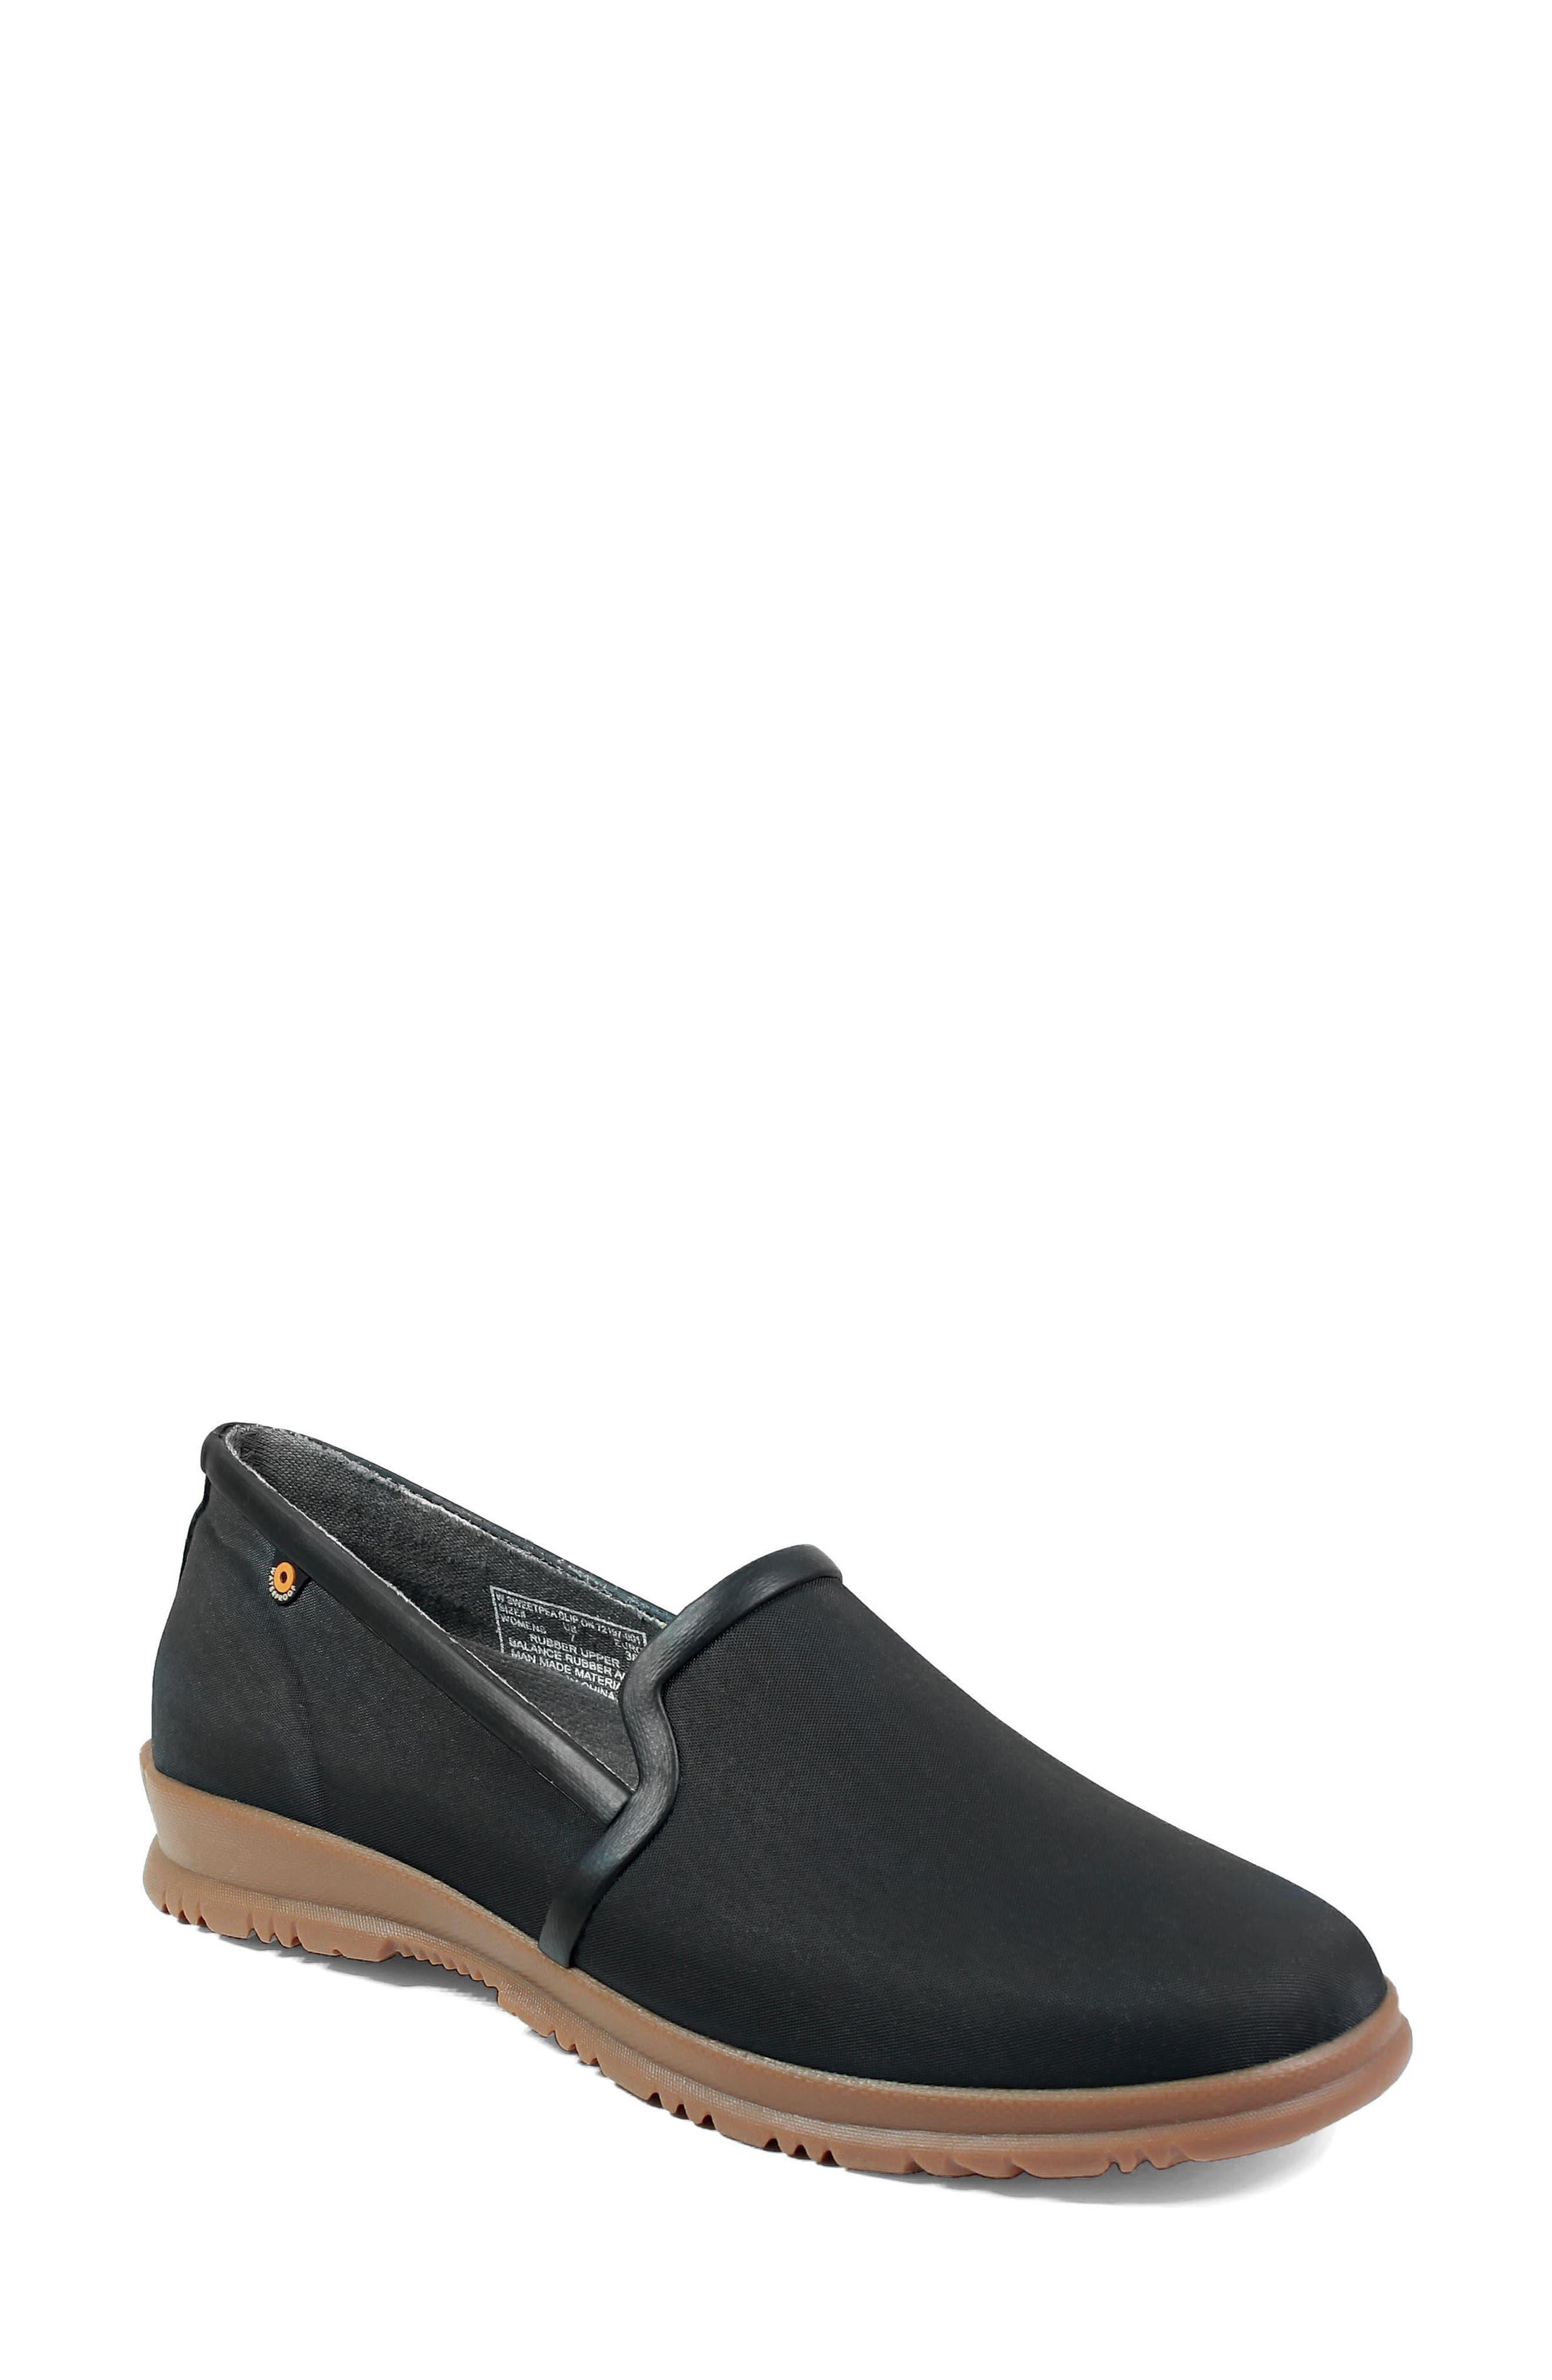 Sweetpea Waterproof Slip-On Sneaker,                             Main thumbnail 1, color,                             BLACK FABRIC